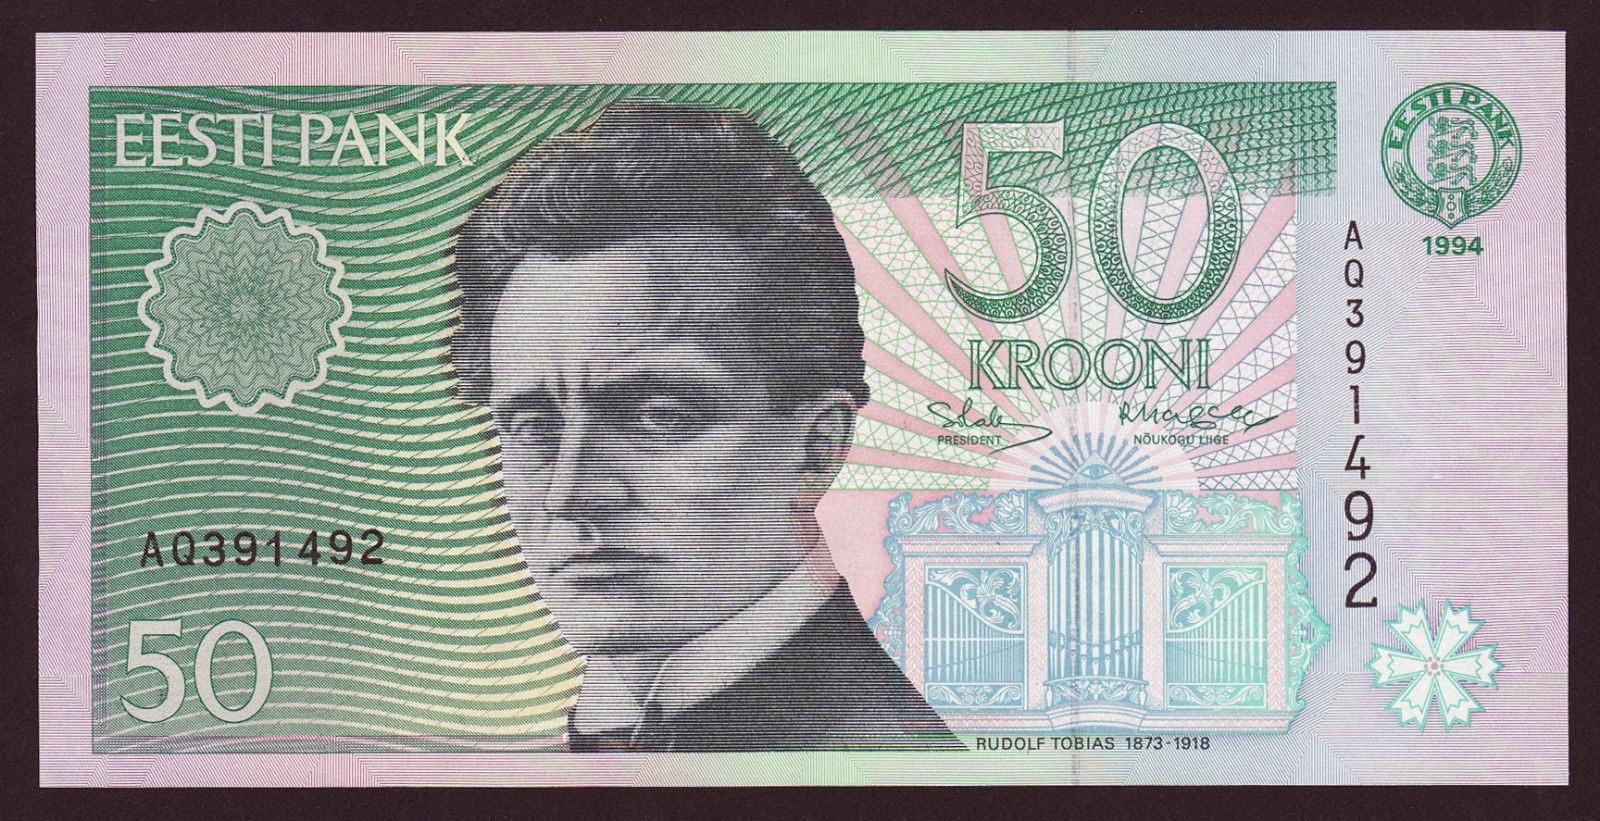 Estonia currency money 50 krooni banknote, Rudolf Tobias